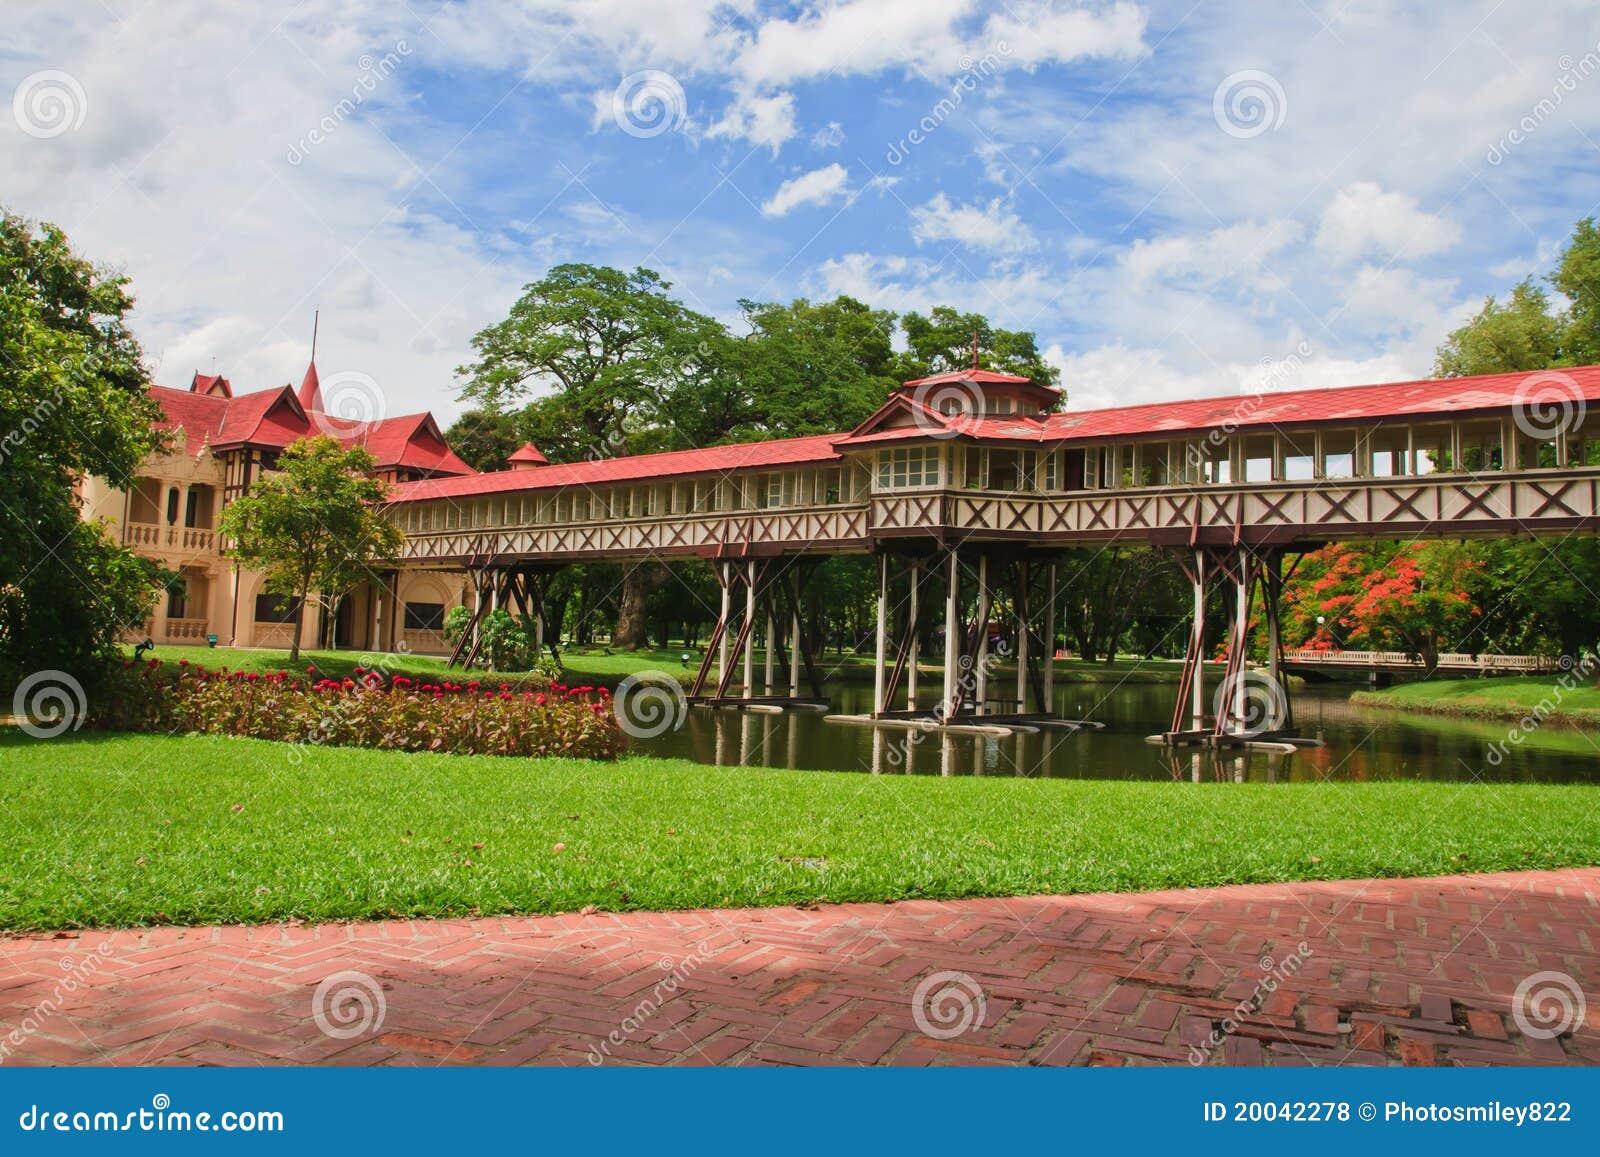 Sanam Chan Palace Royalty Free Stock Photos - Image: 20042278